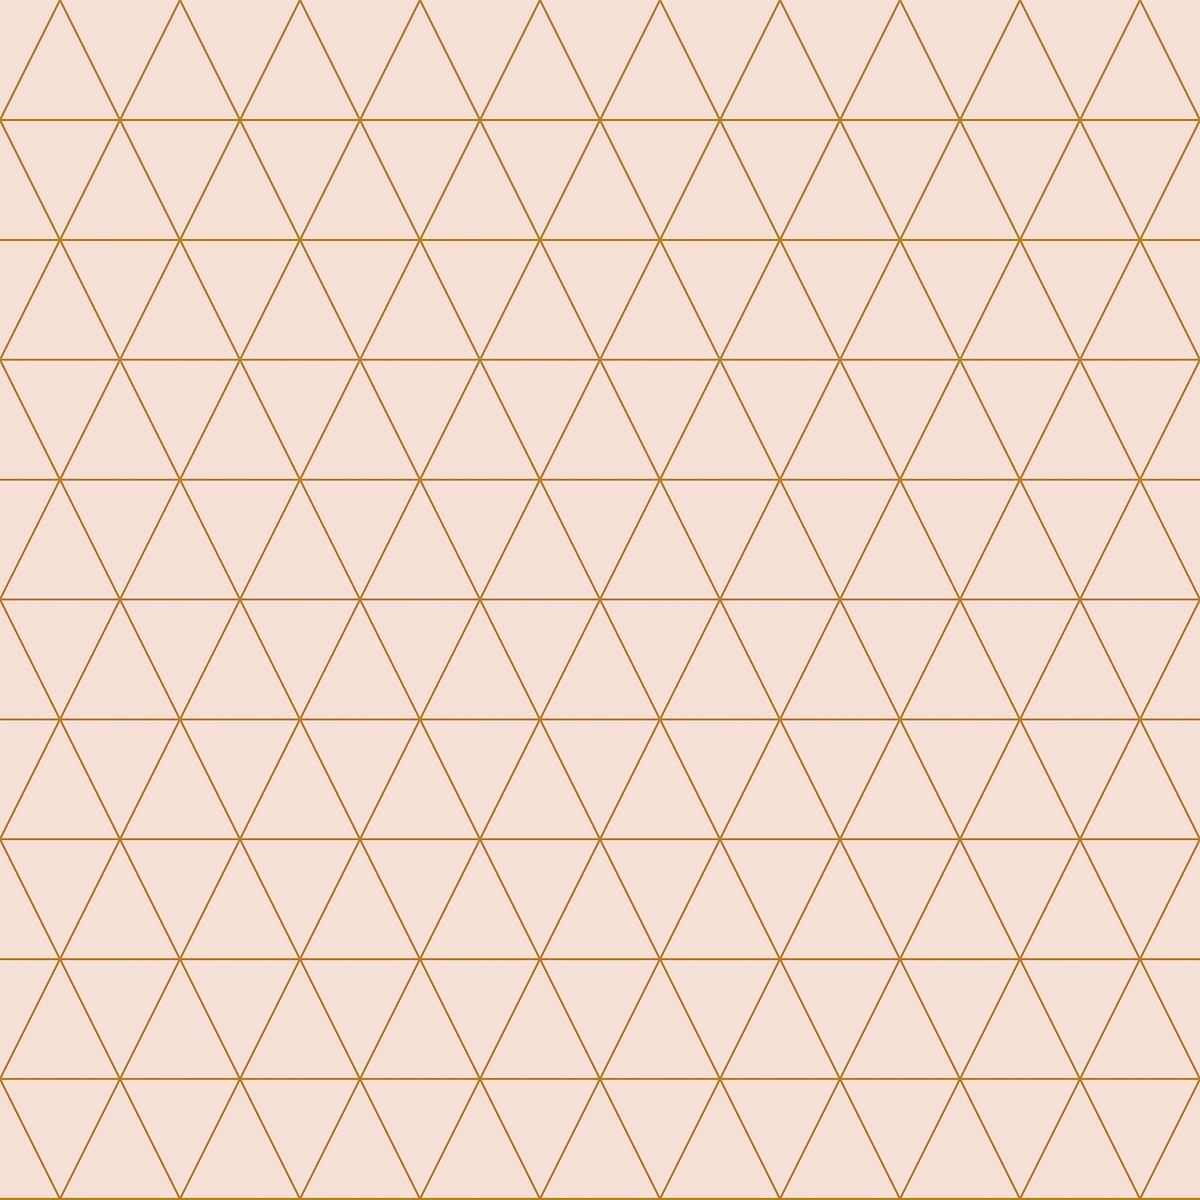 Simple triangular pattern vector illustration